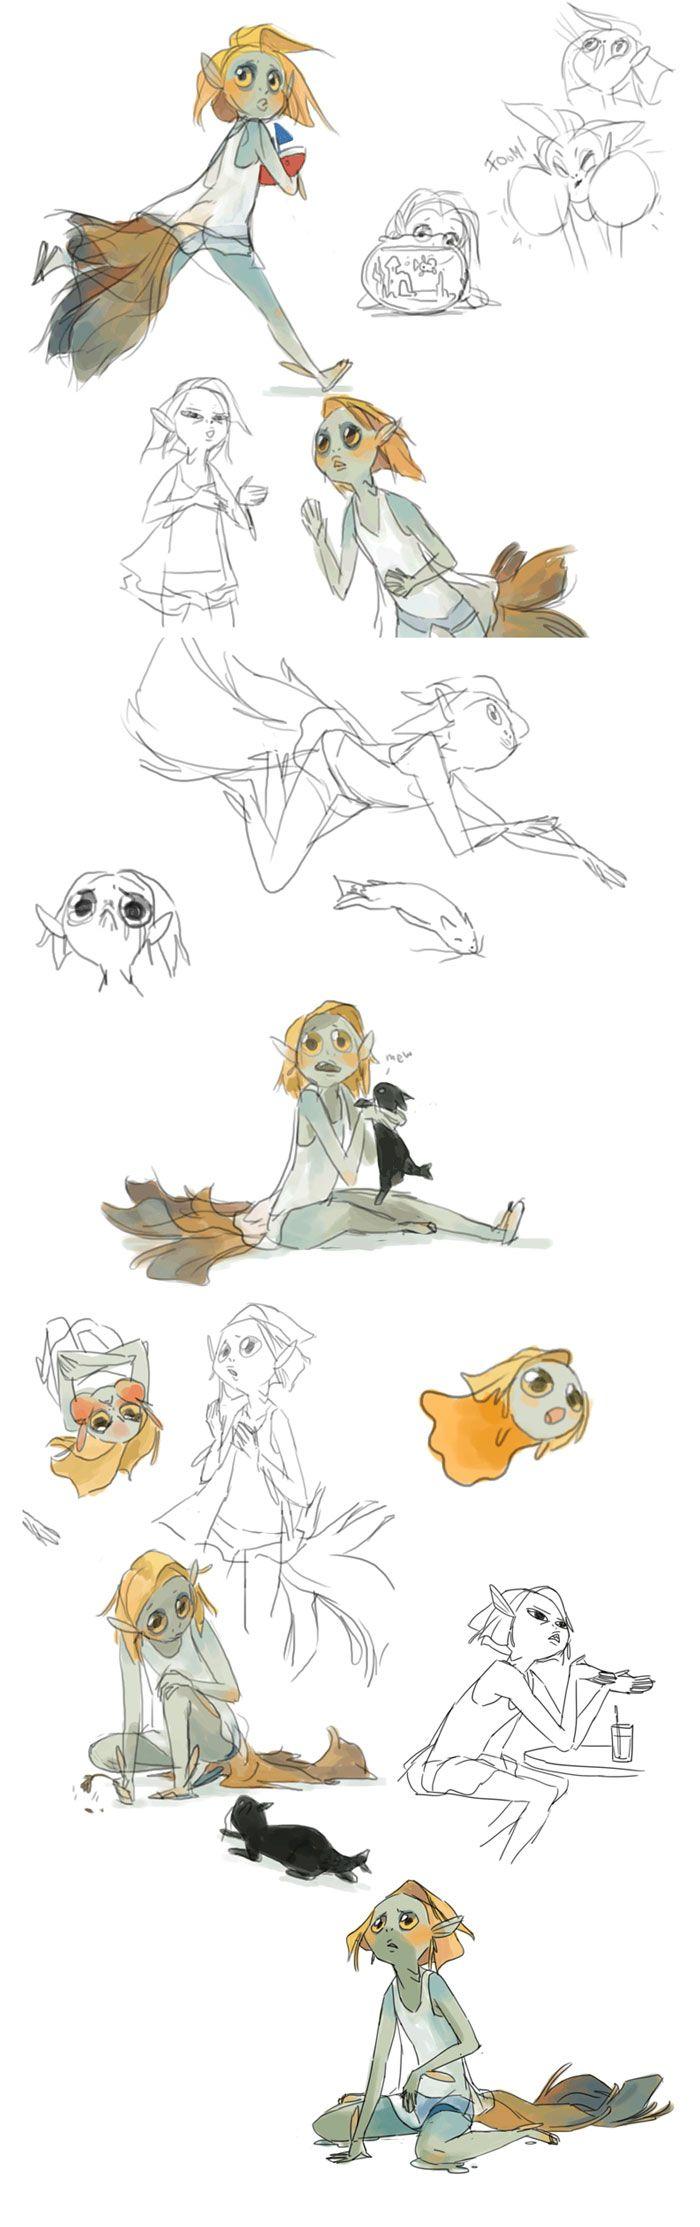 Character Design References Website : Art by evon freeman website evonyo tumblr